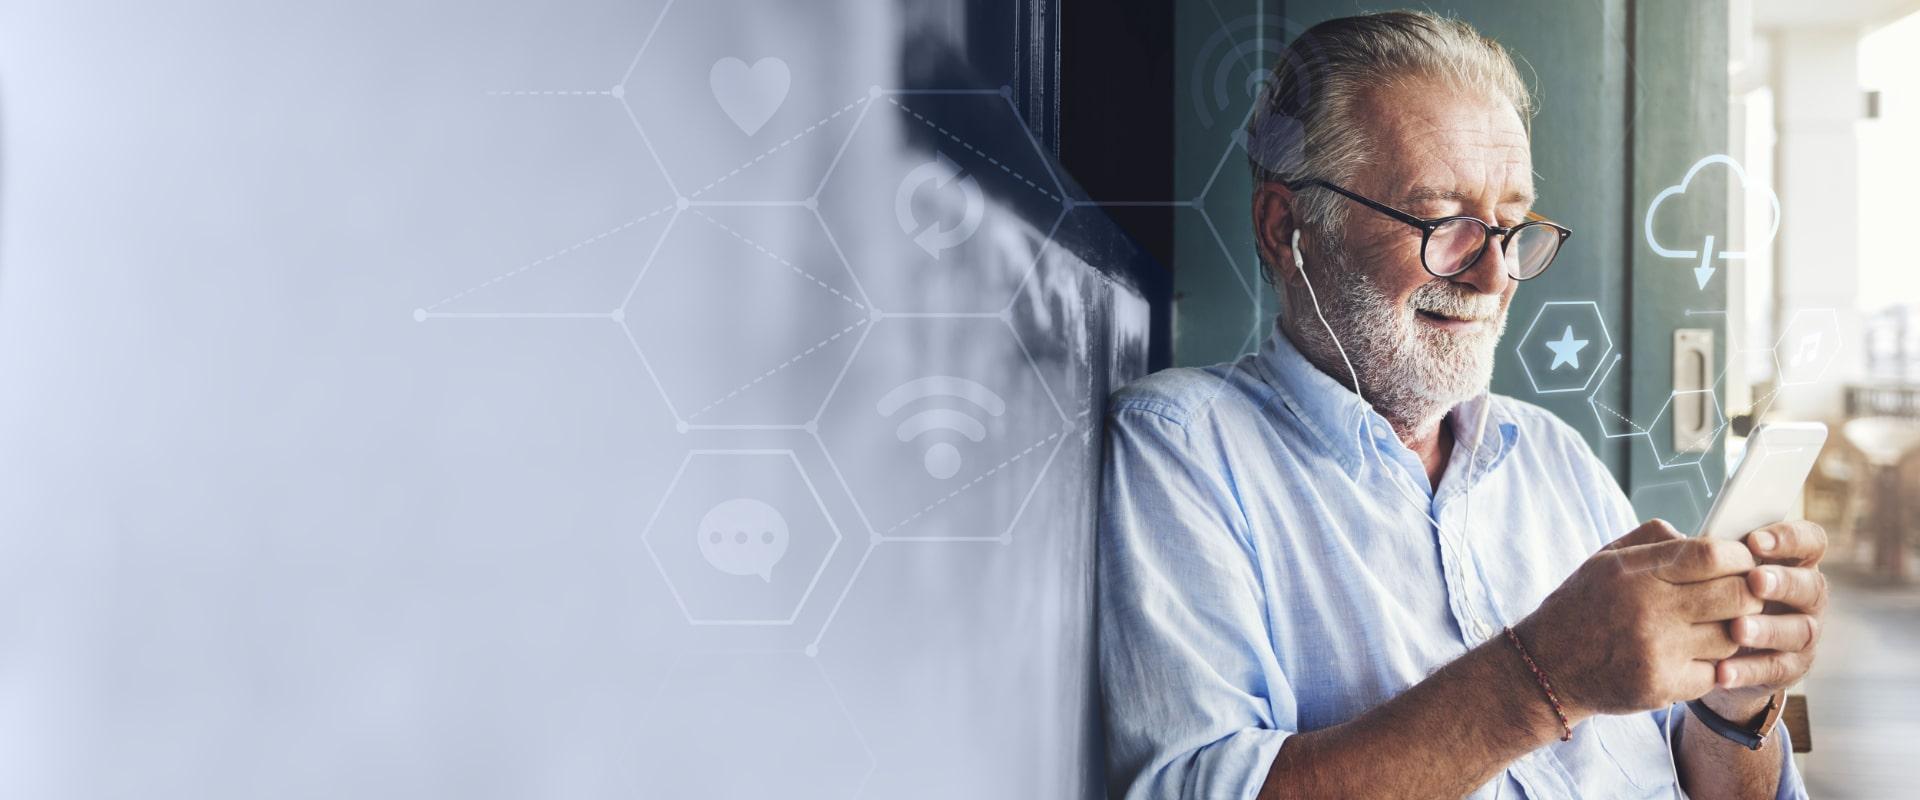 Elderly male using a phone